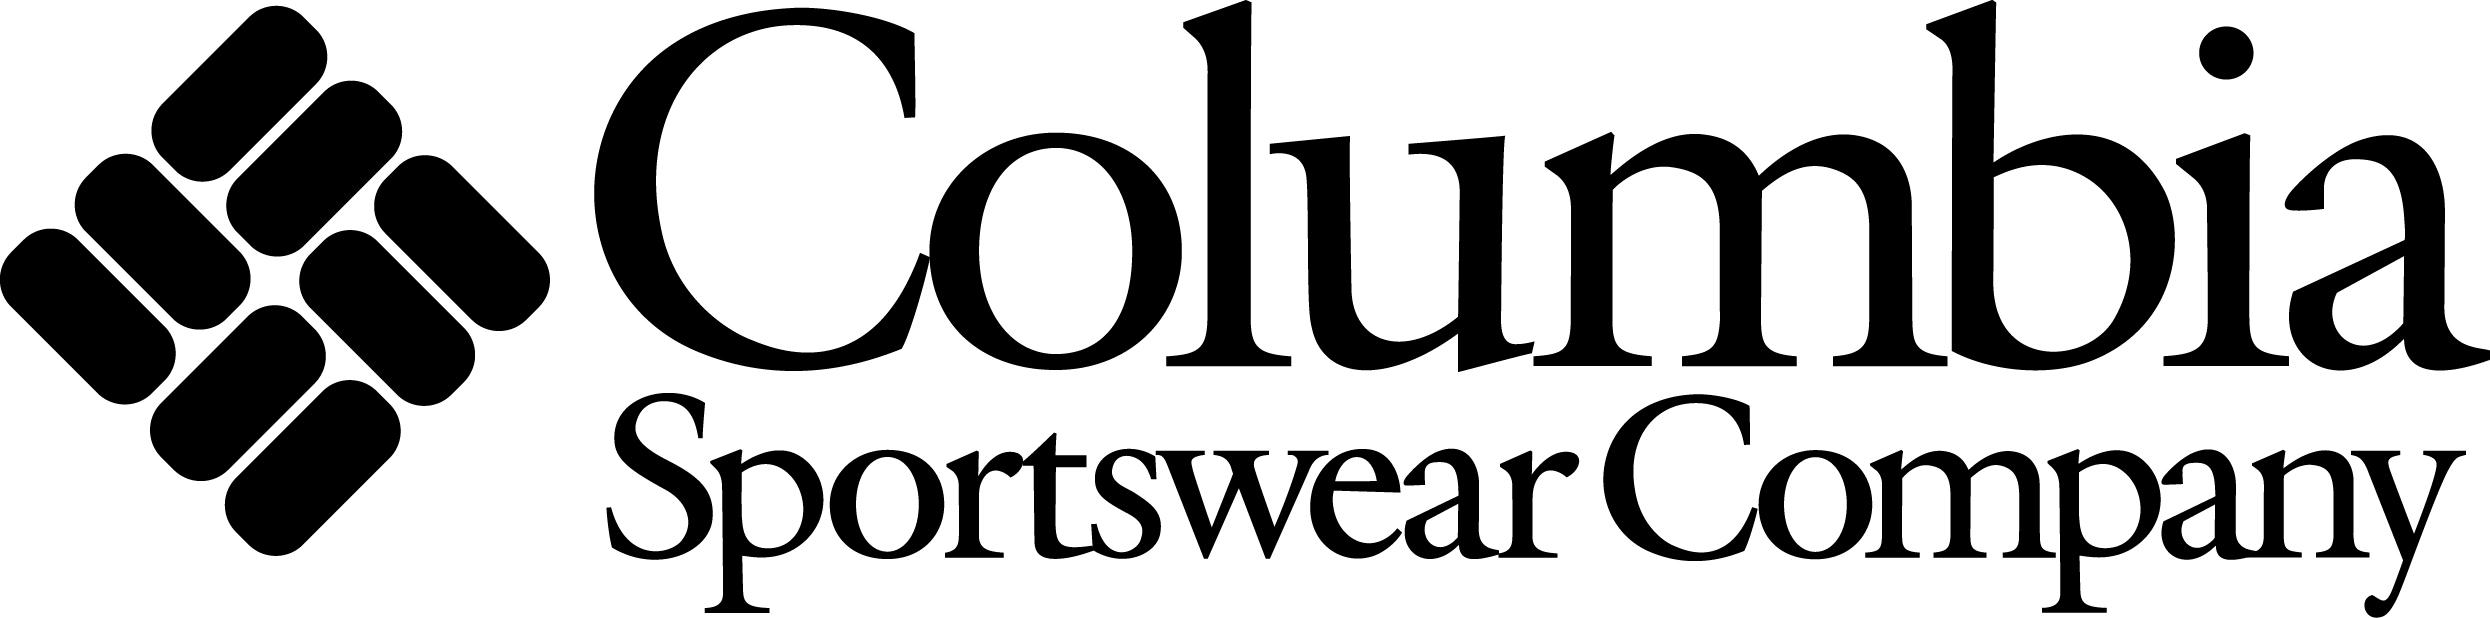 Columbia_4Element_Corporate_Black.jpg